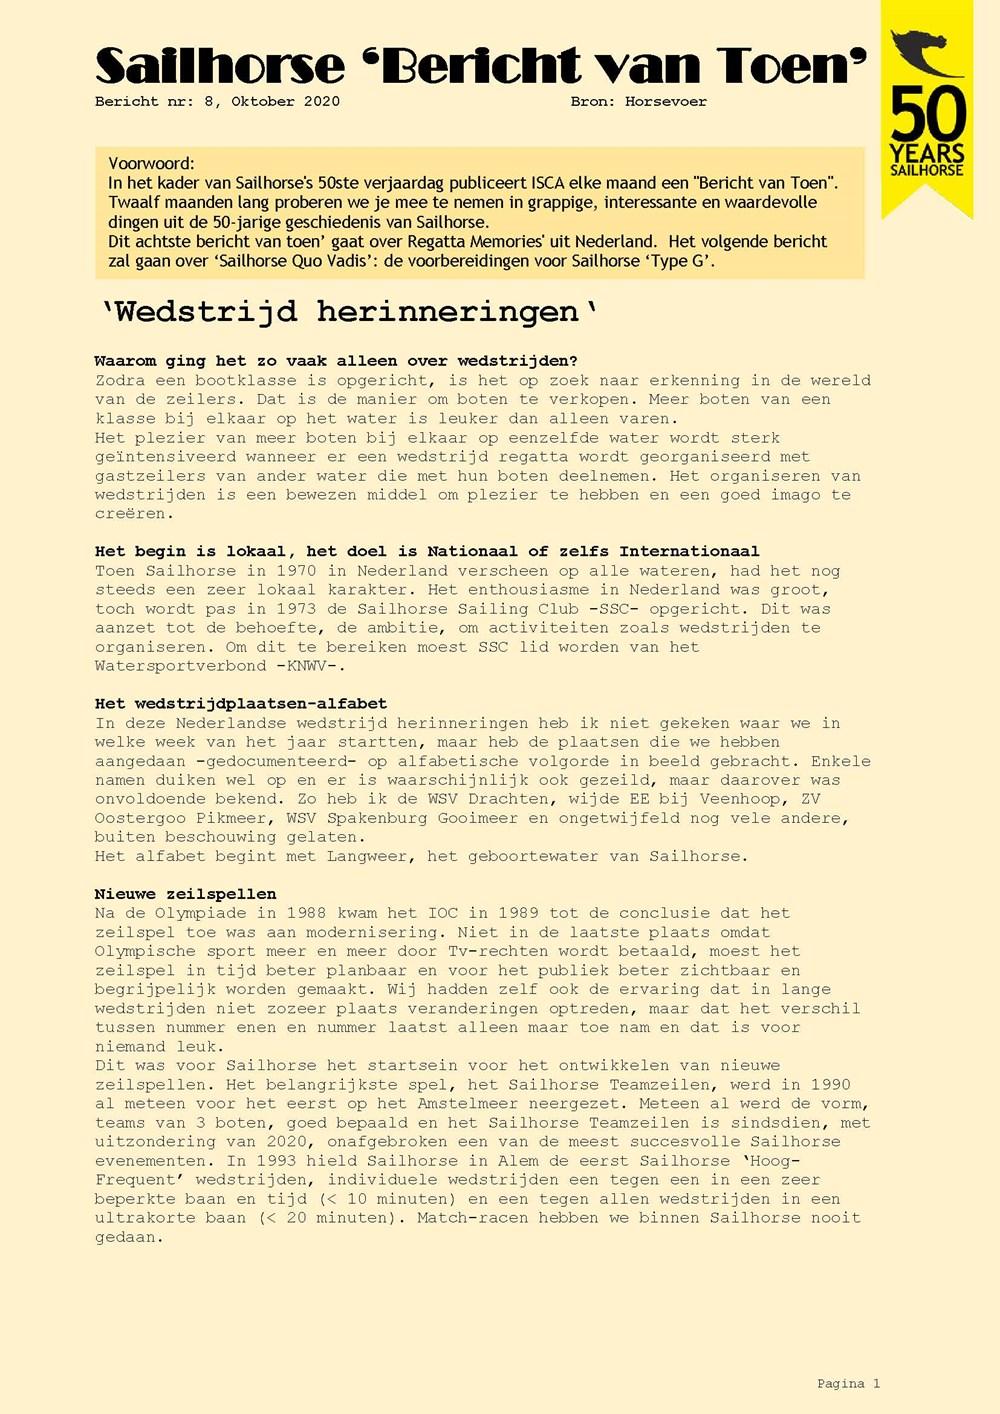 BvT8_Page_01.jpg